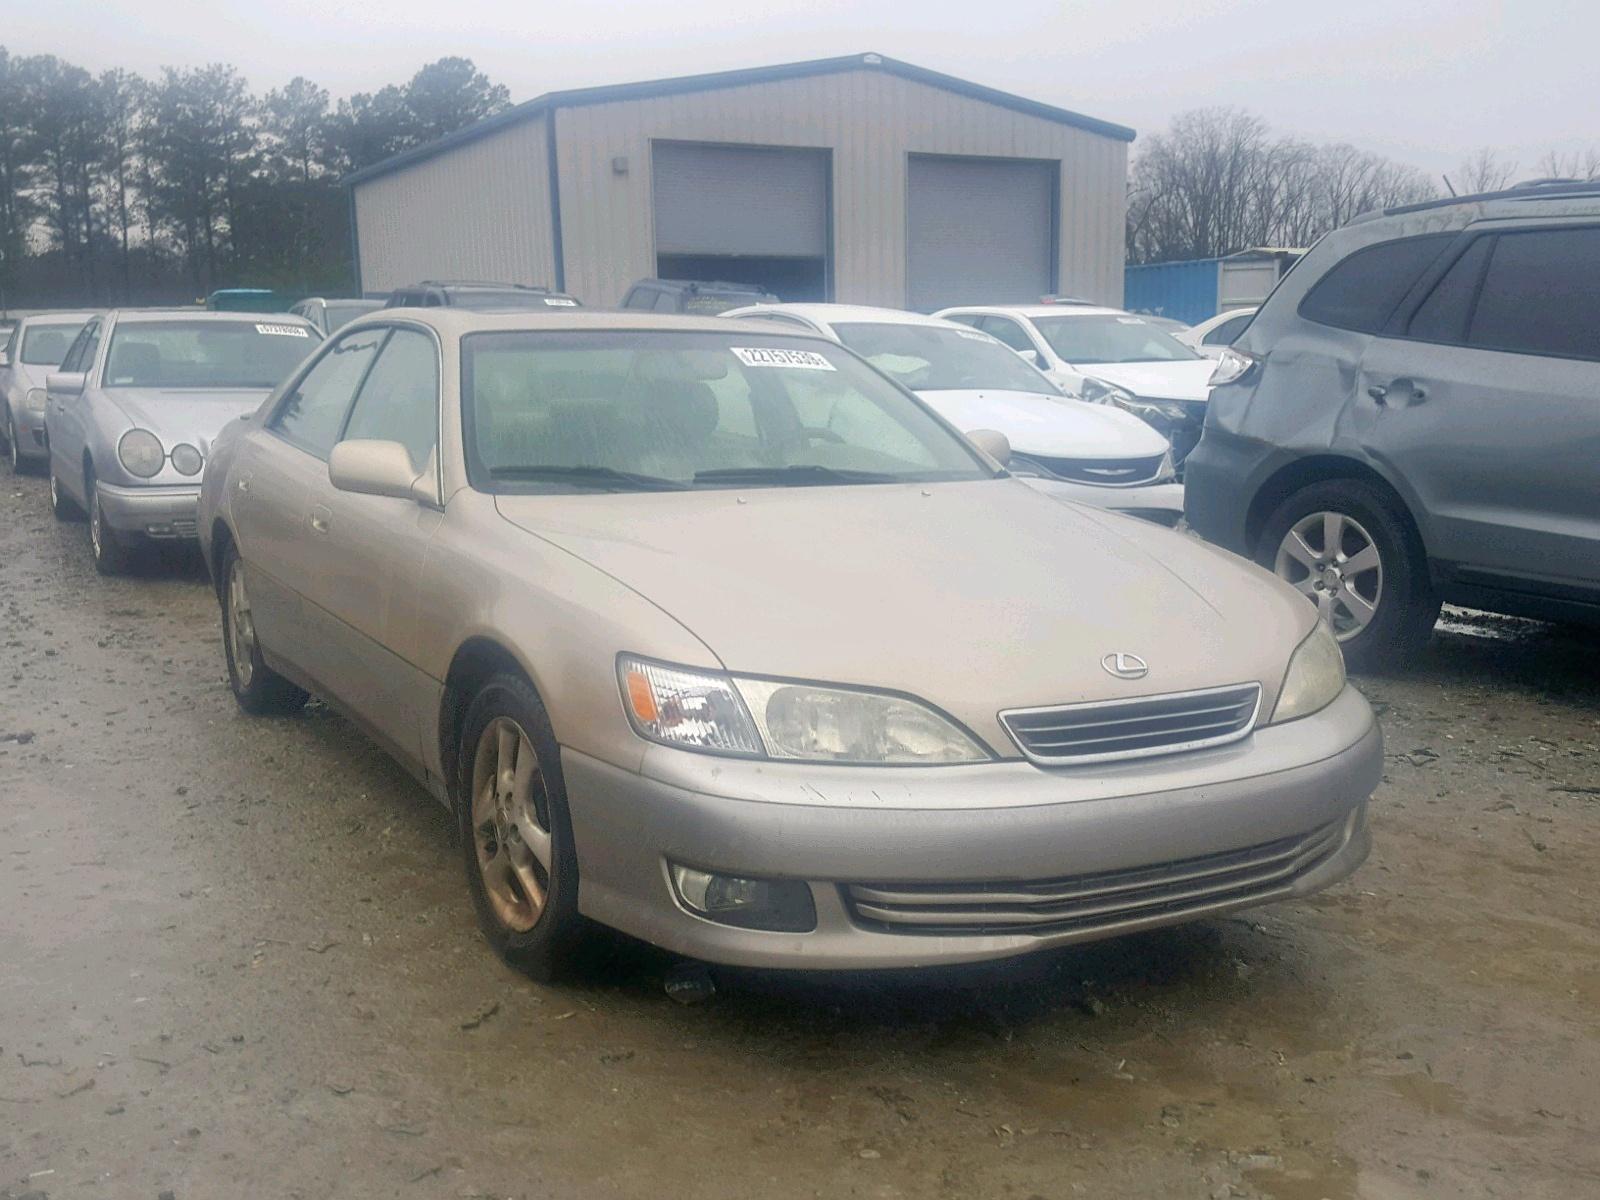 Salvage 2001 Lexus ES 300 for sale